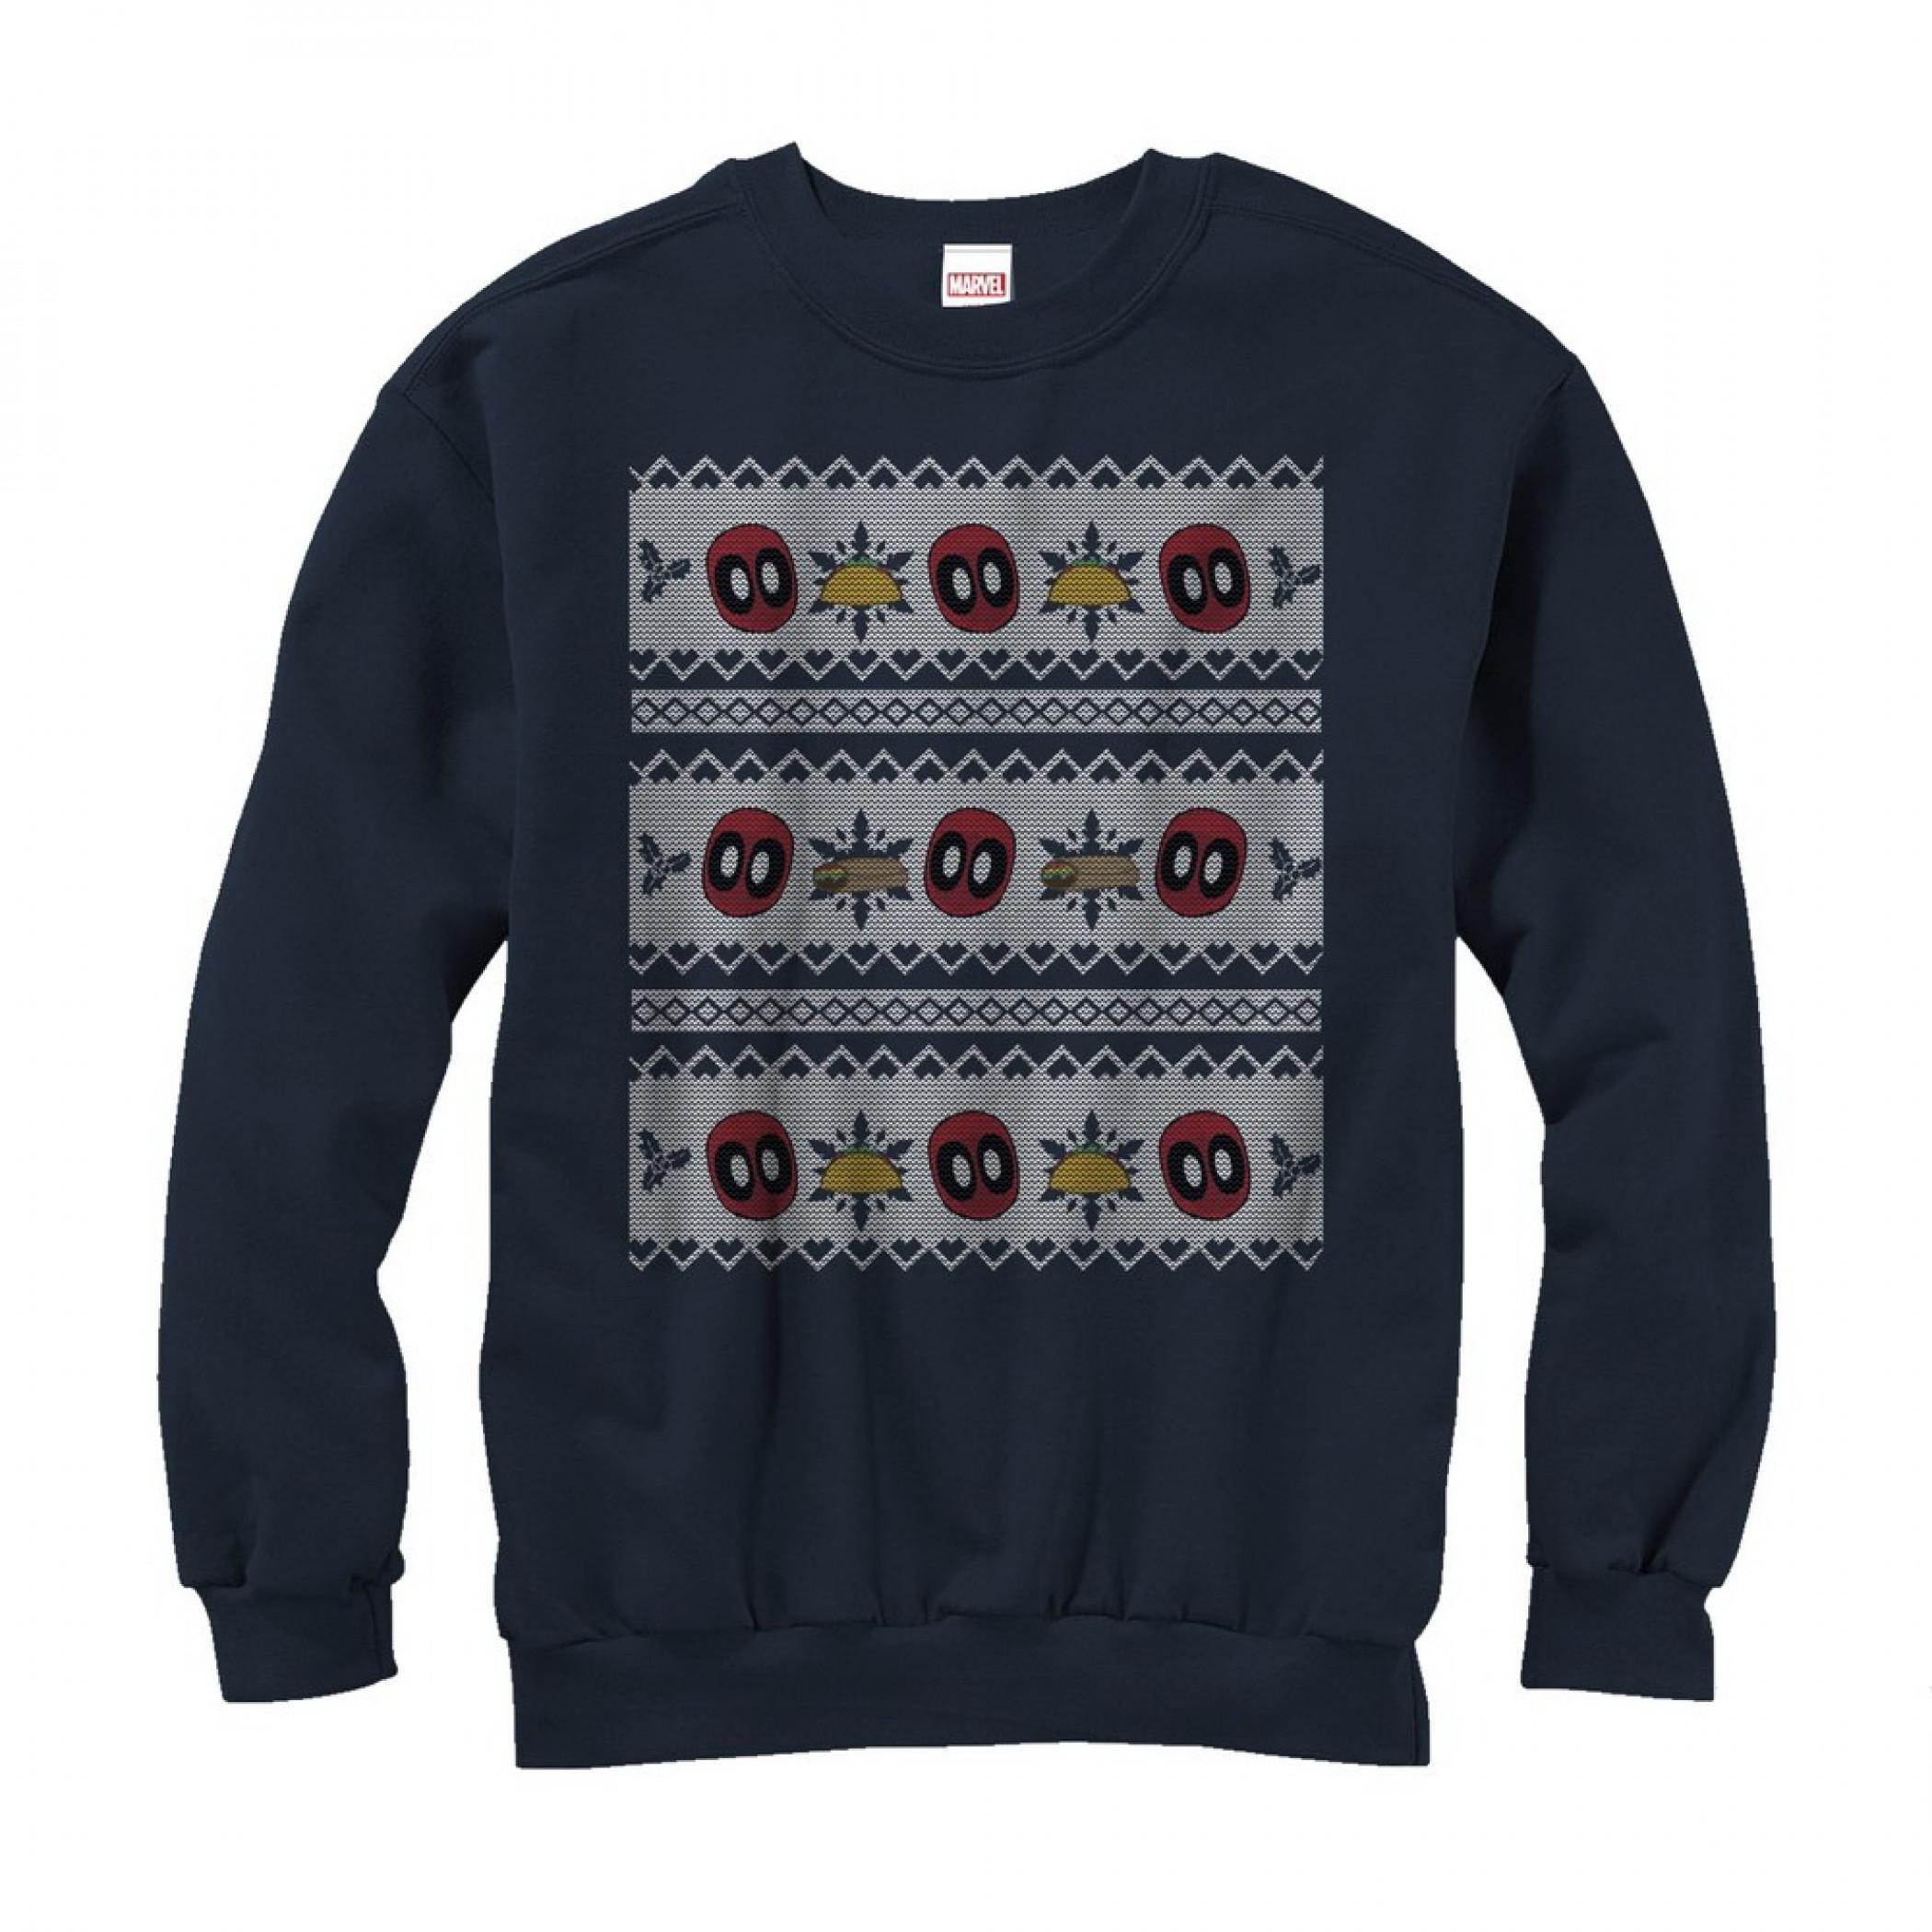 Deadpool Tacos Ugly Christmas Sweater Design Sweatshirt